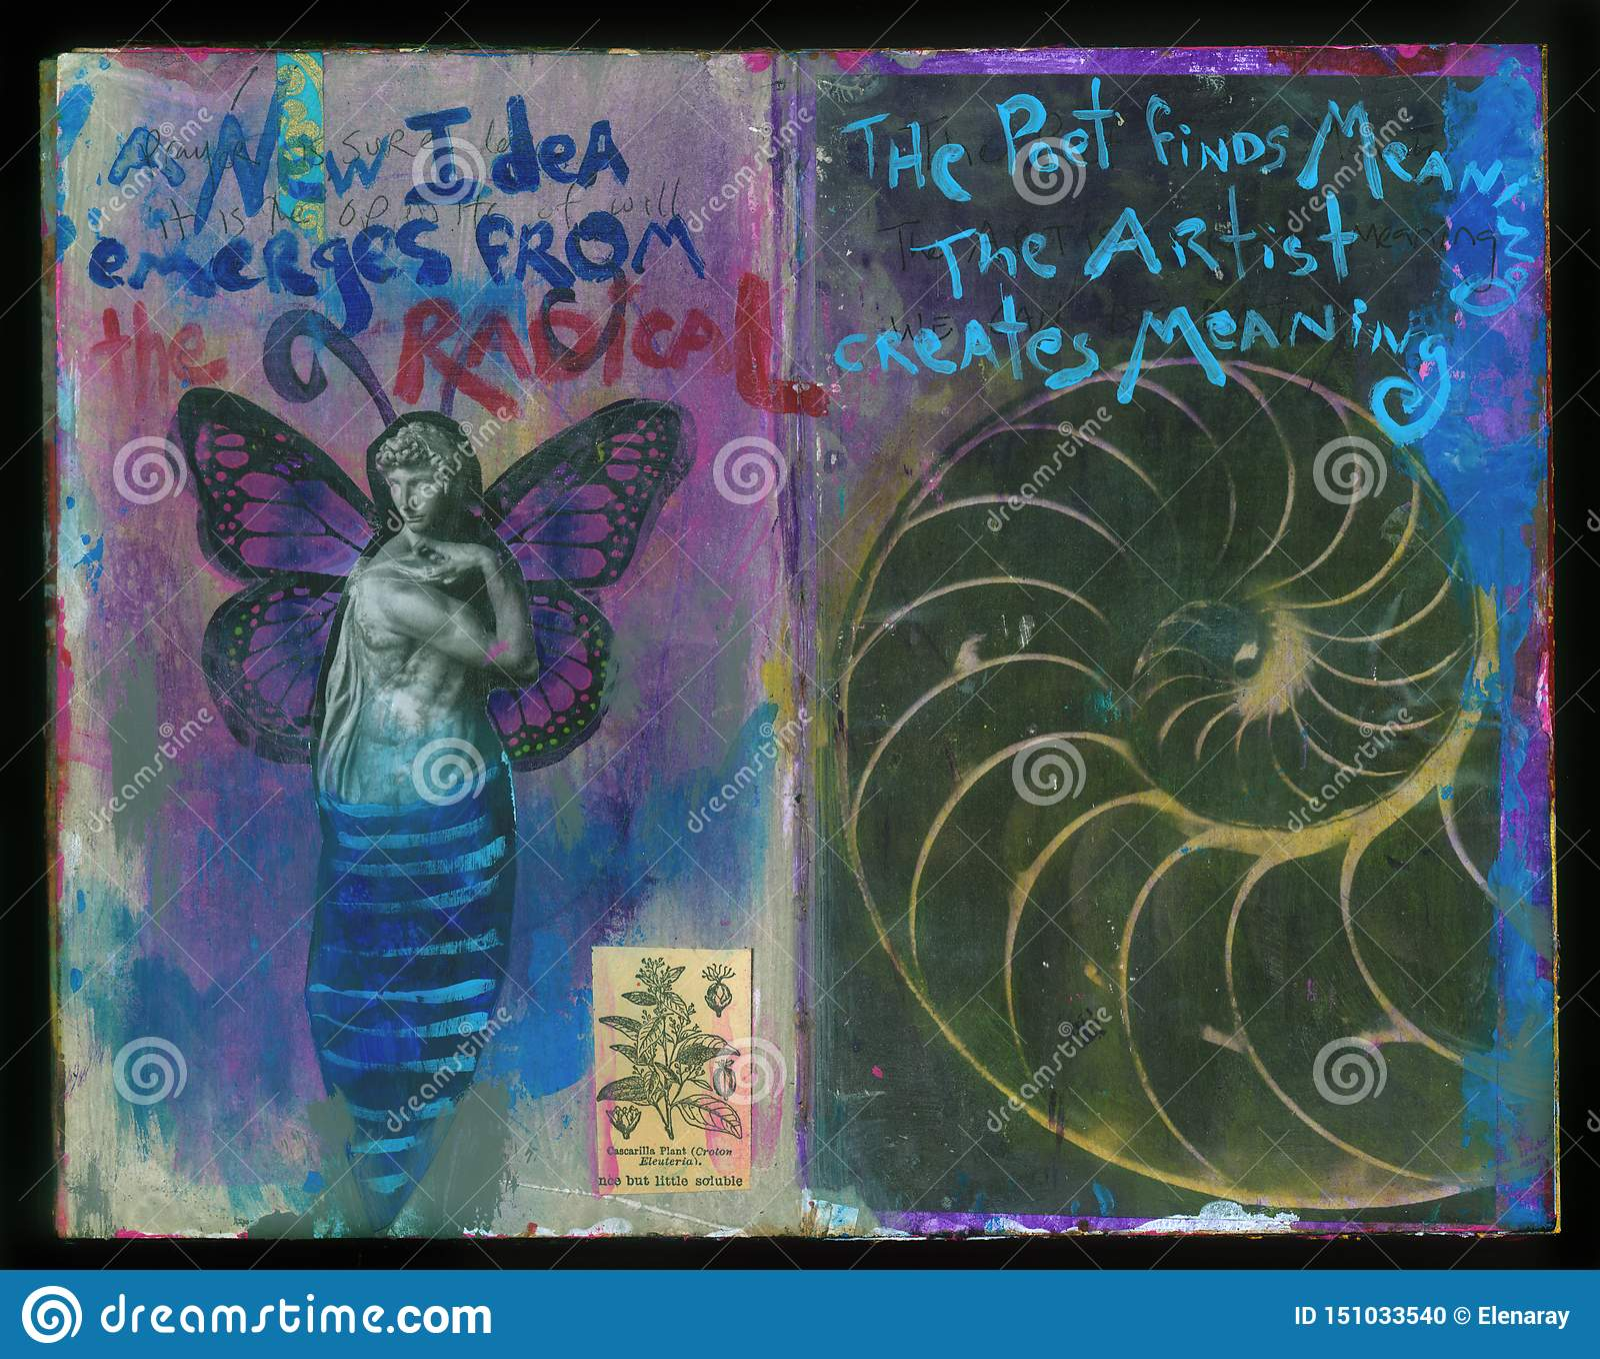 A New Idea Artist`s Crazy Wisdom Handmade Collage Art